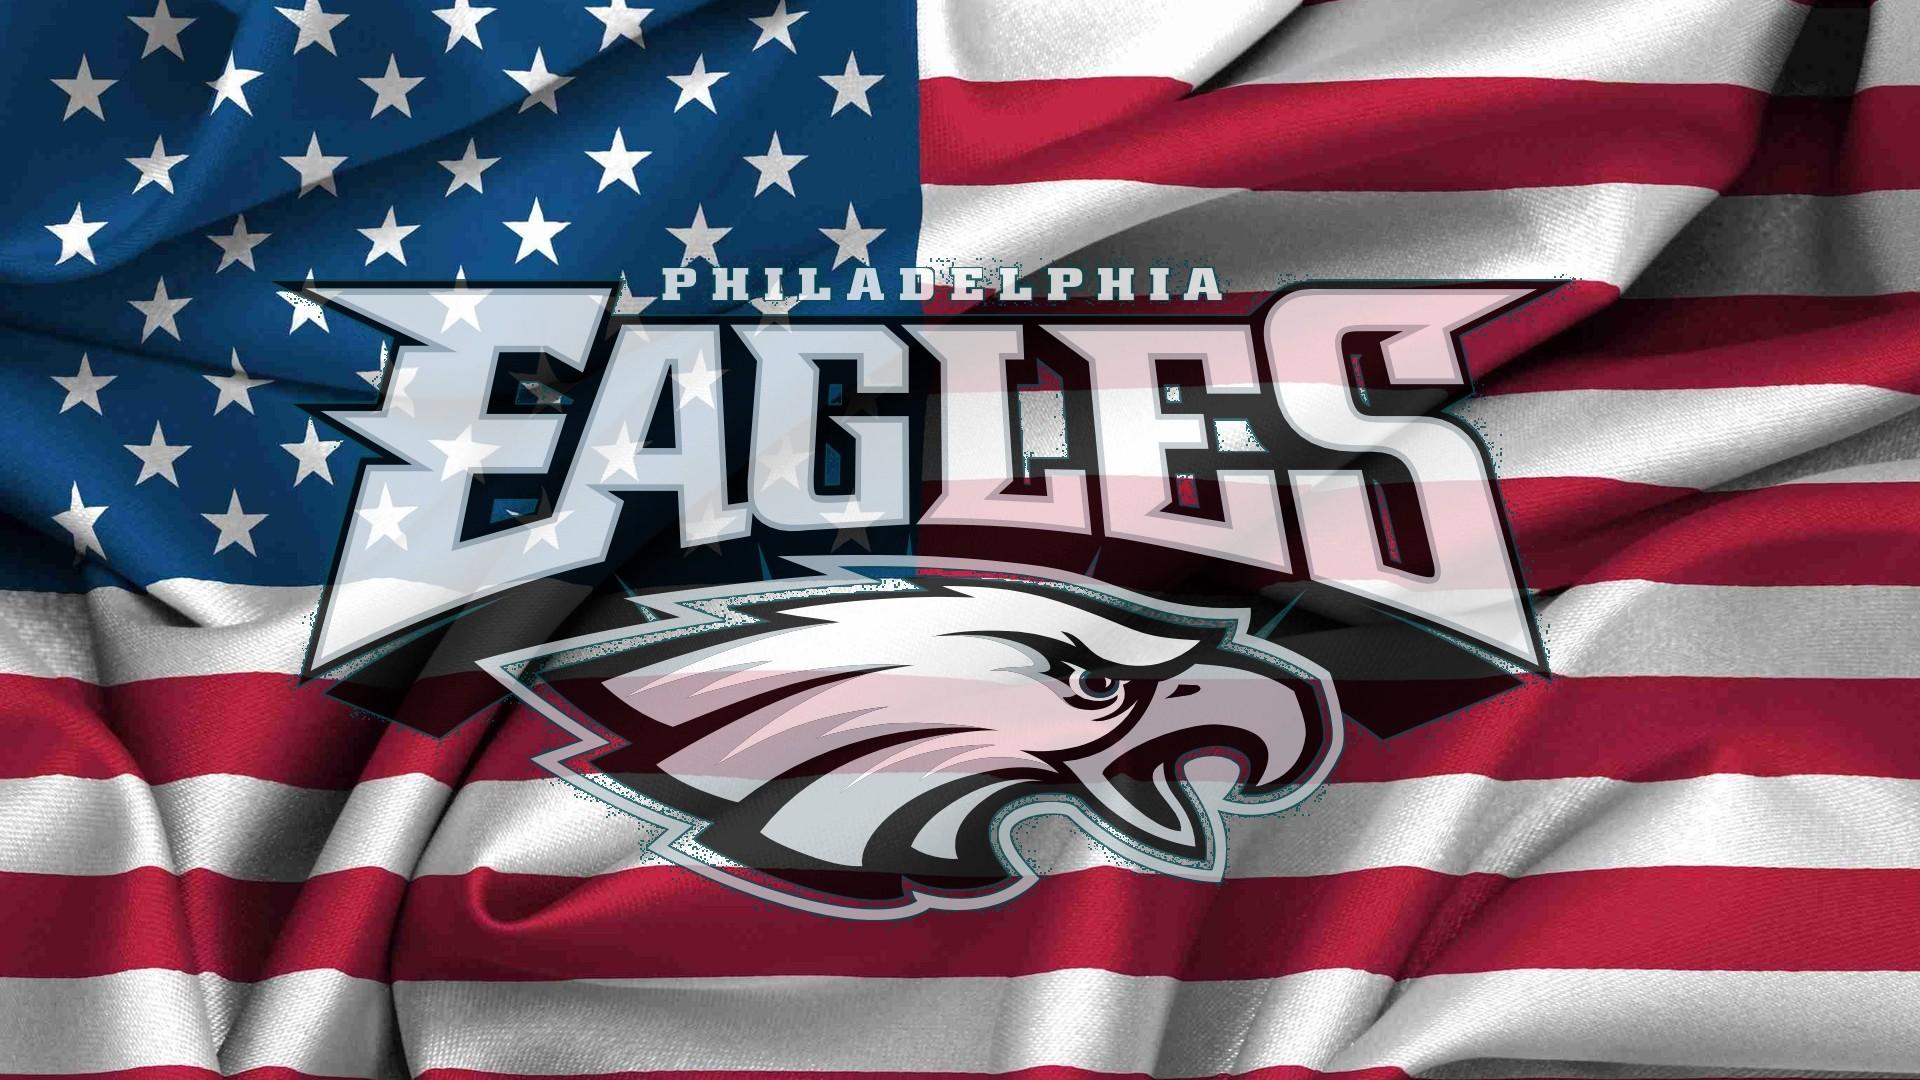 philadelphia eagles logo on usa flag windy